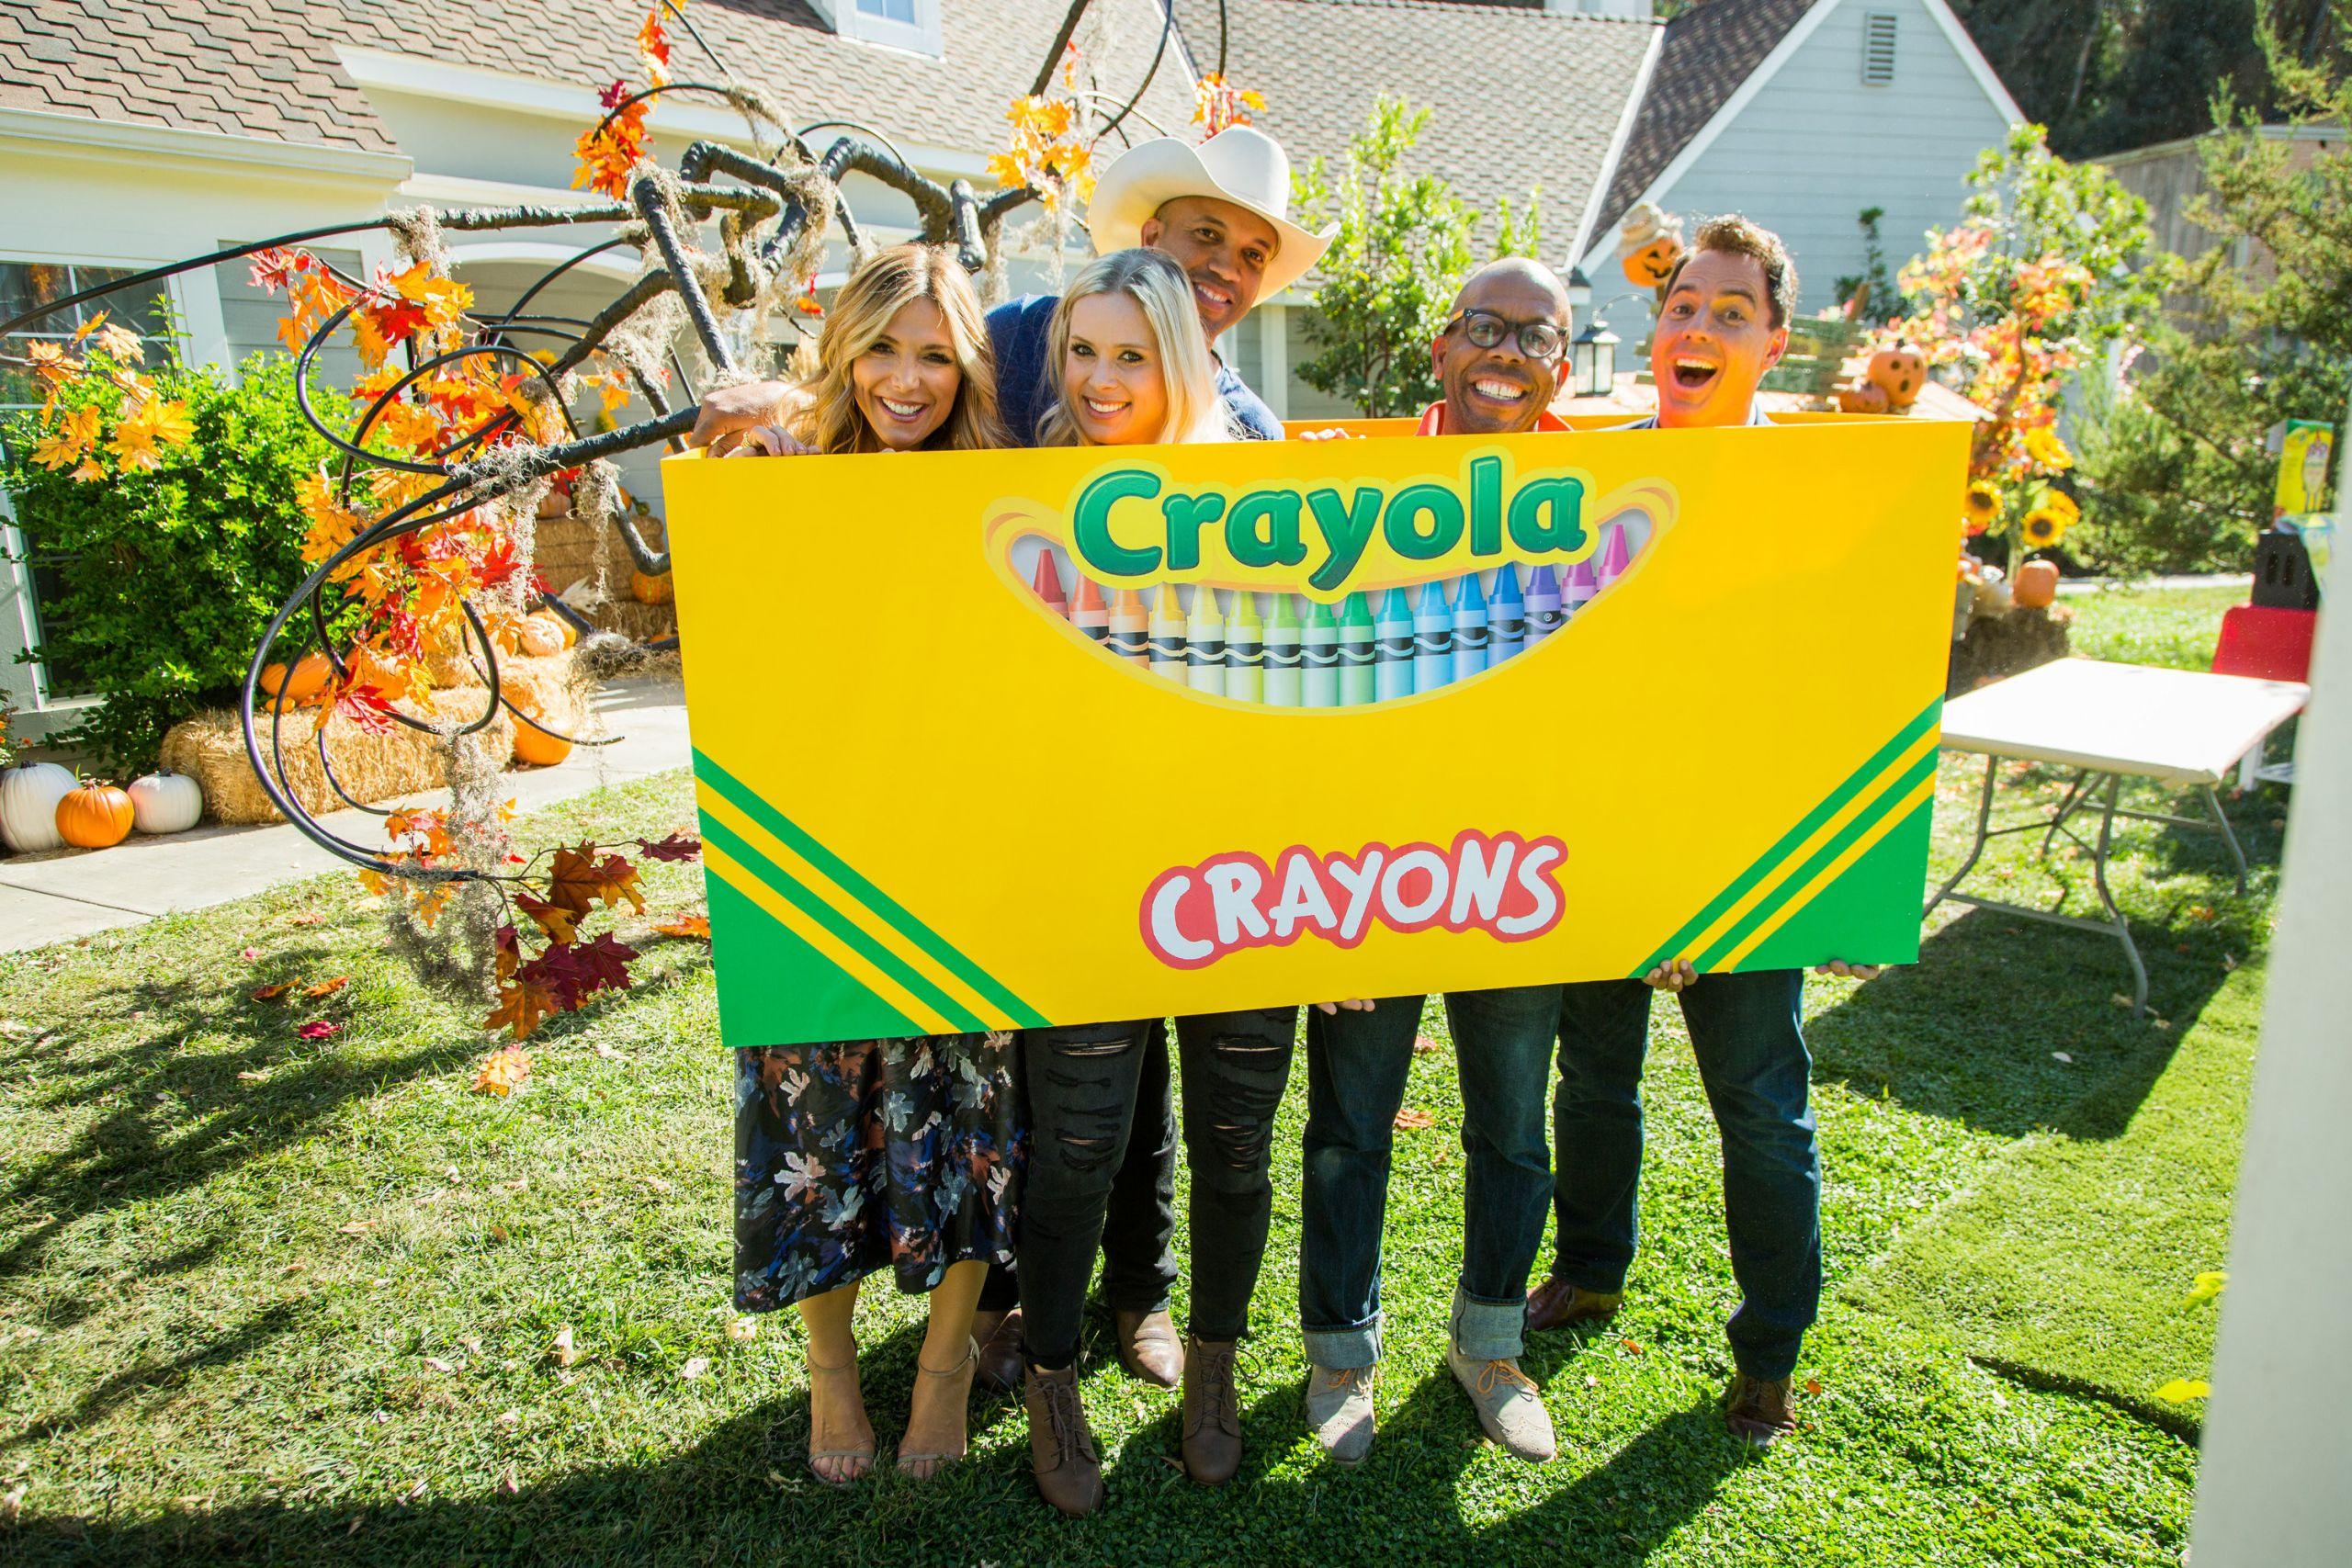 DIY Crayon Costume  DIY Family Crayon Costume Home & Family